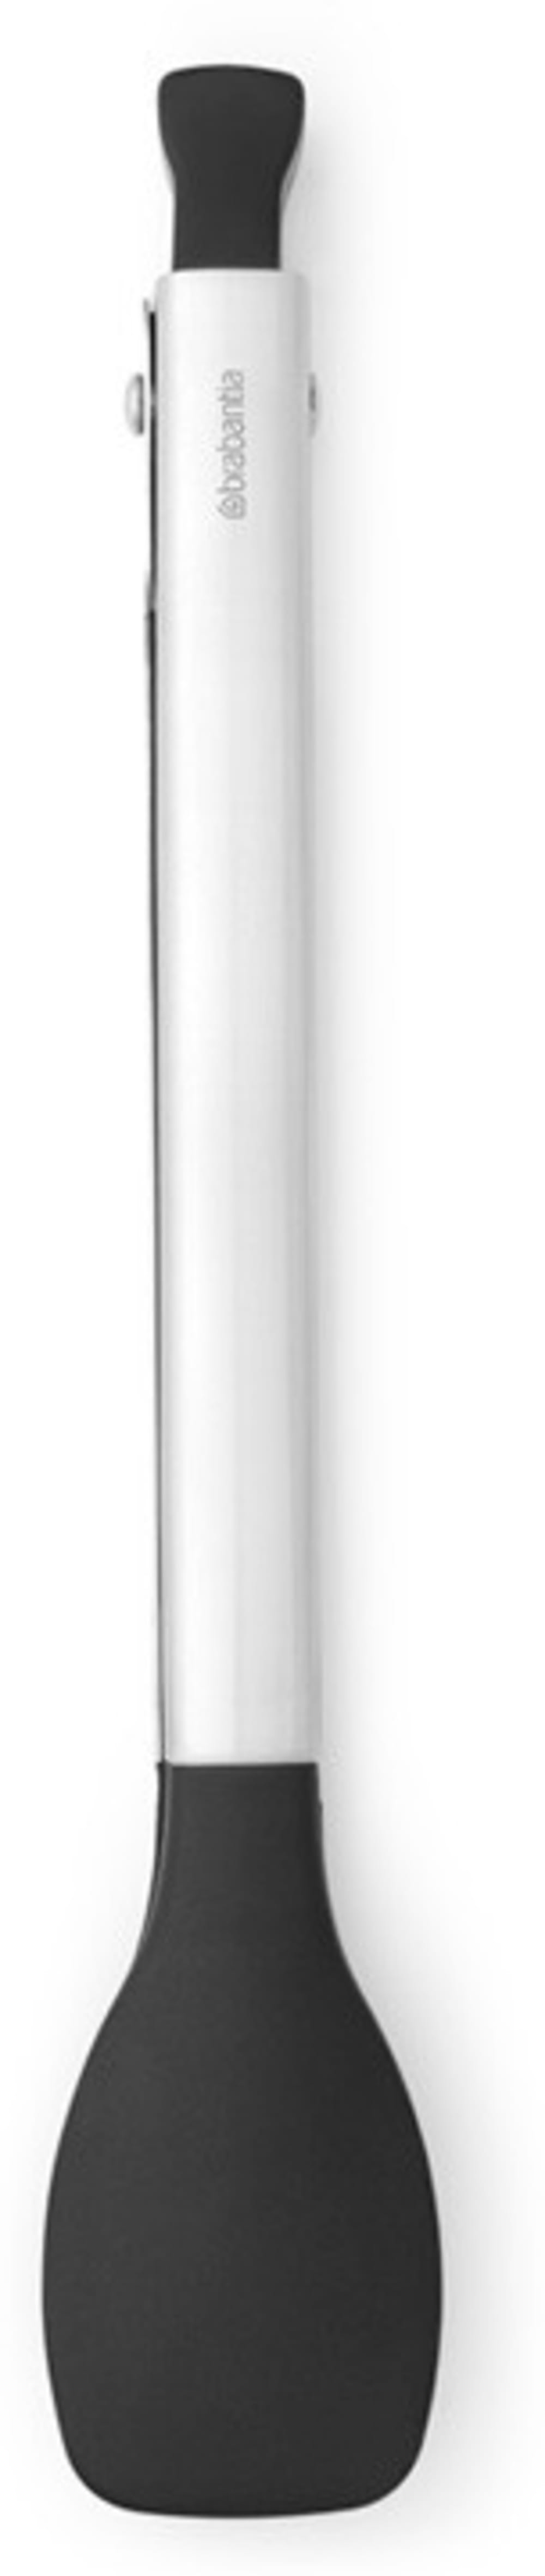 Brabantia szczypce non stick Profile